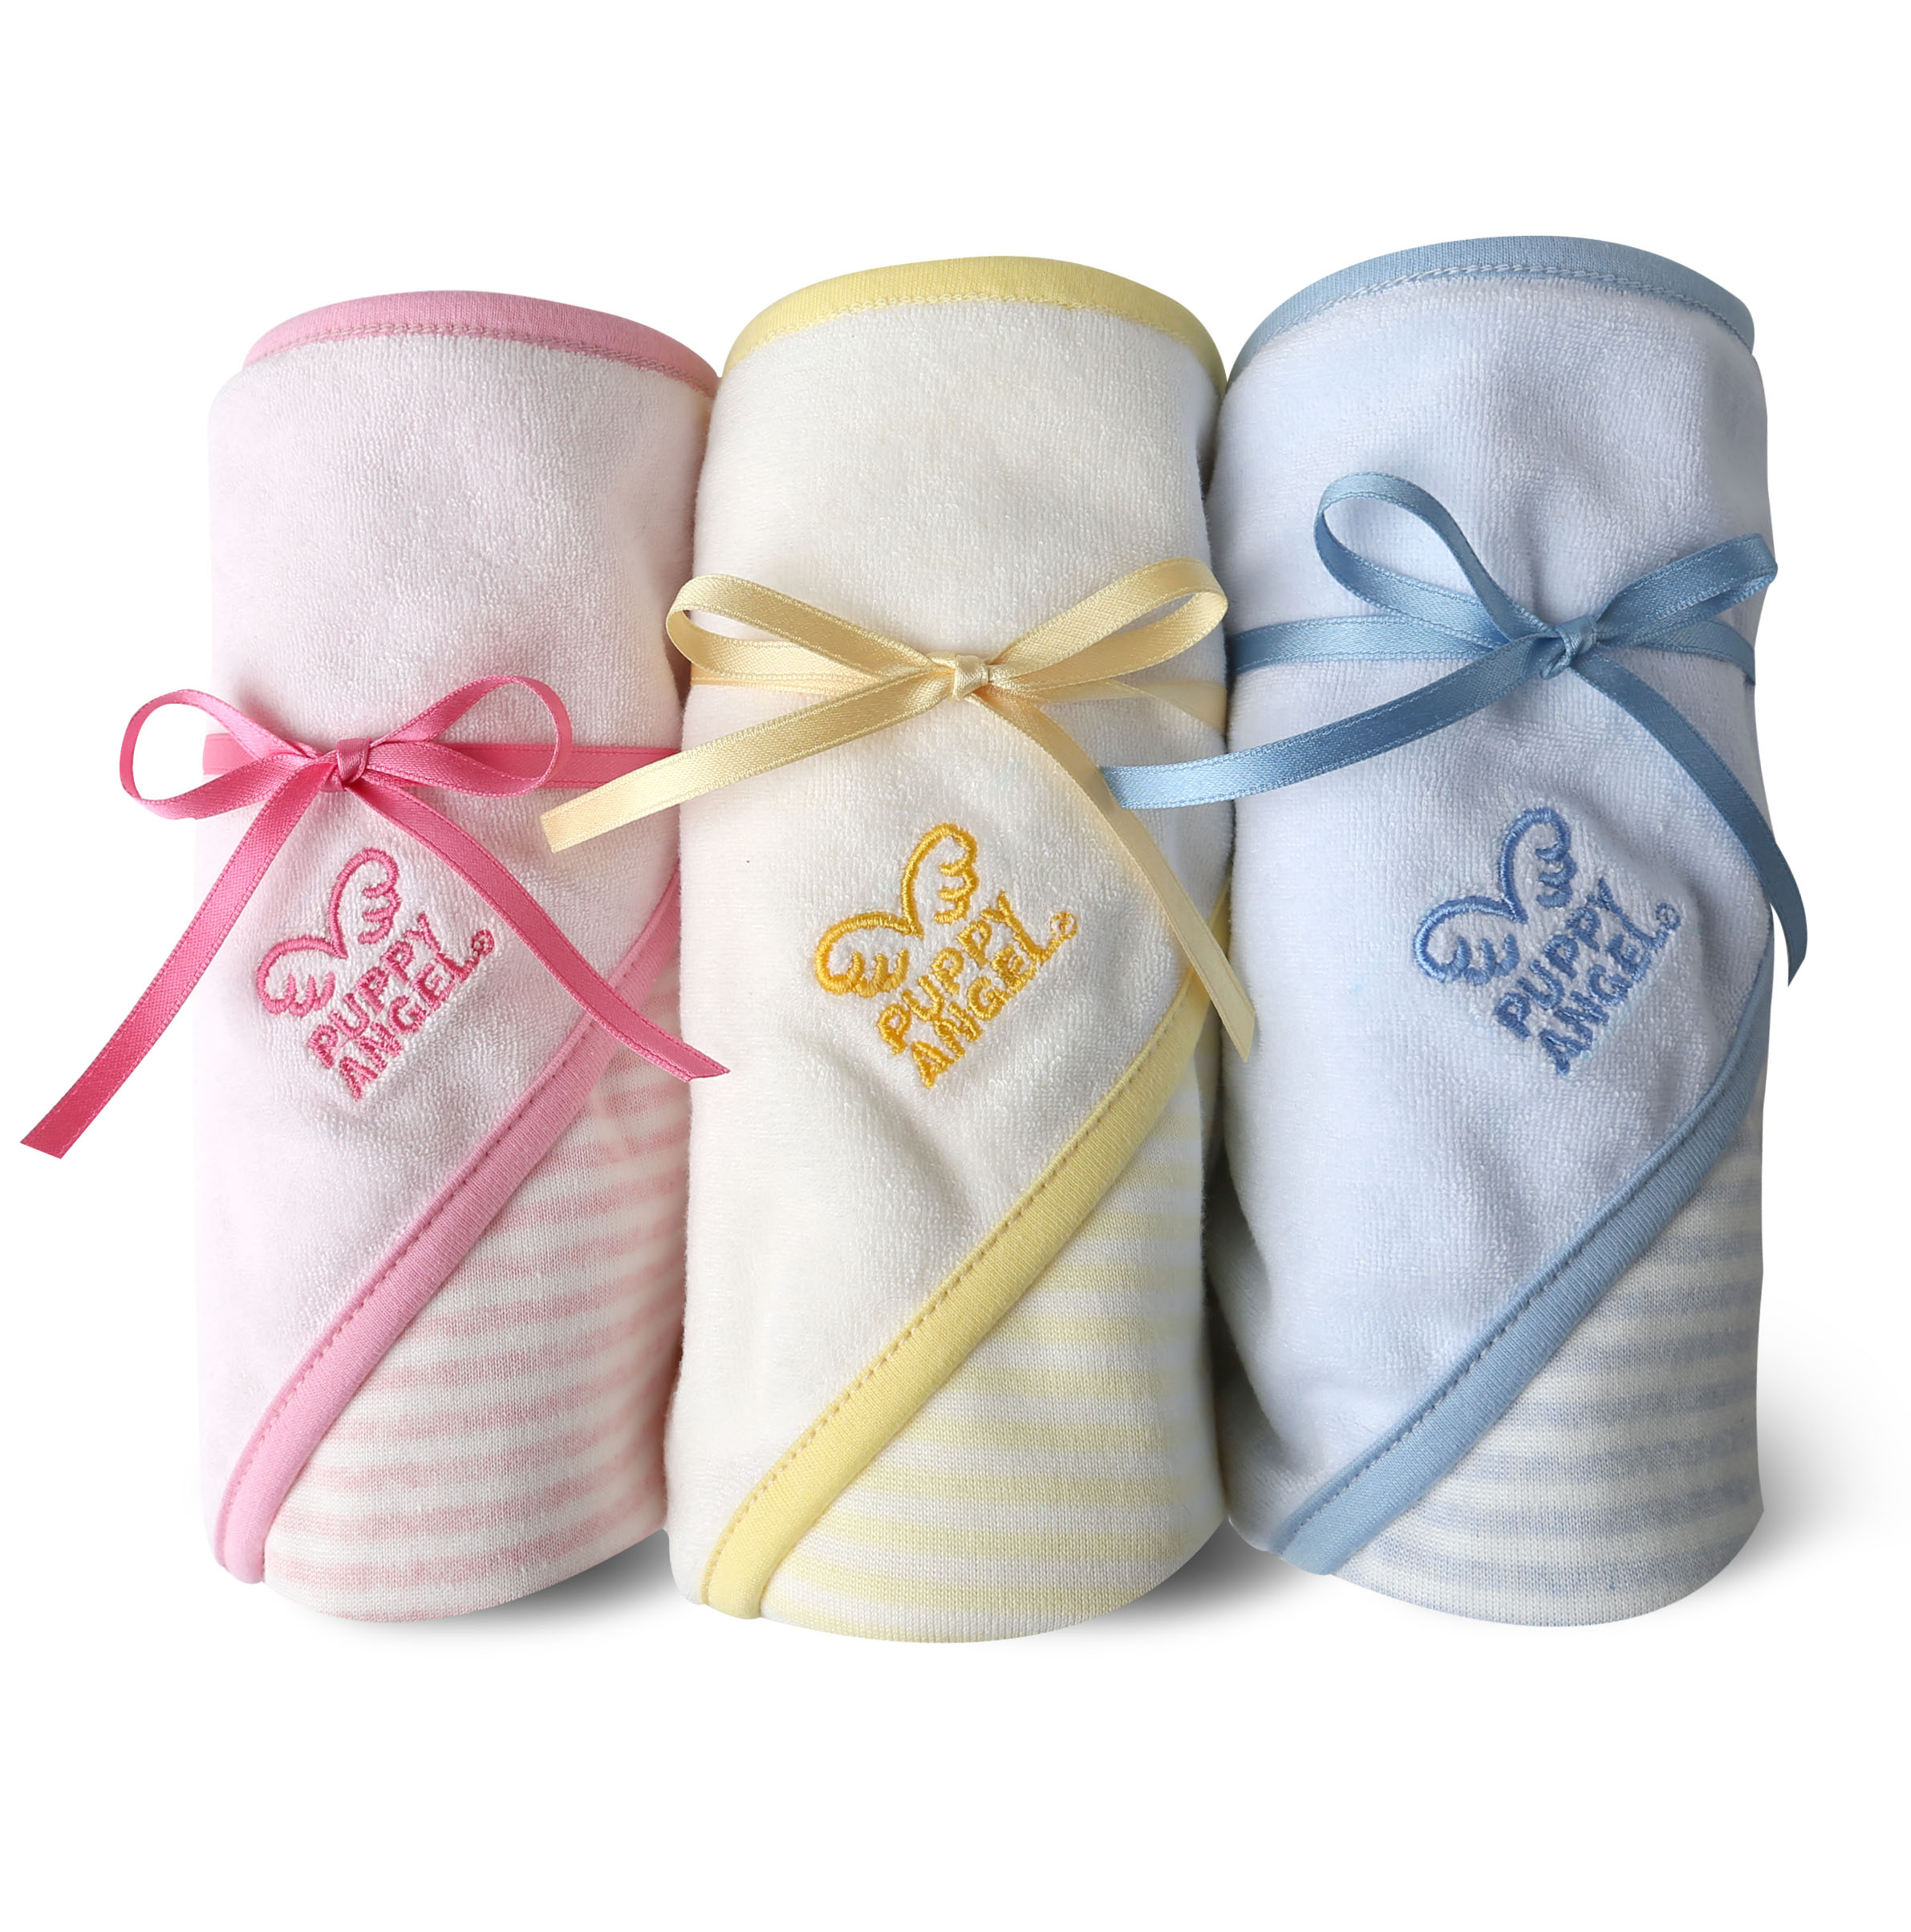 Hooded Towel - Hund Spa Hygiene